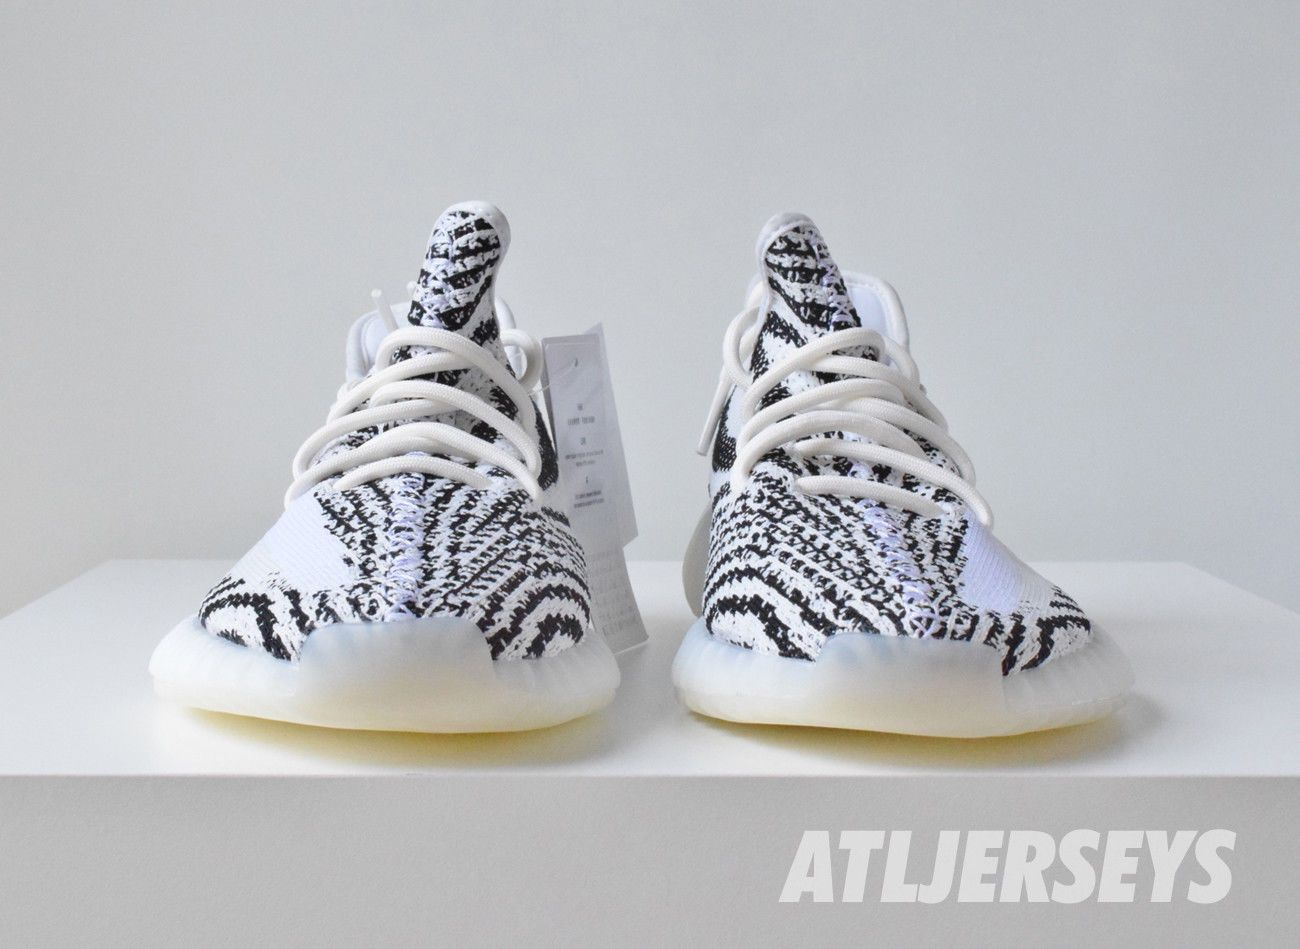 c49c972973593 Adidas Yeezy Boost 350 V2 Zebra Kanye 100% Authentic White Red Size 4-14